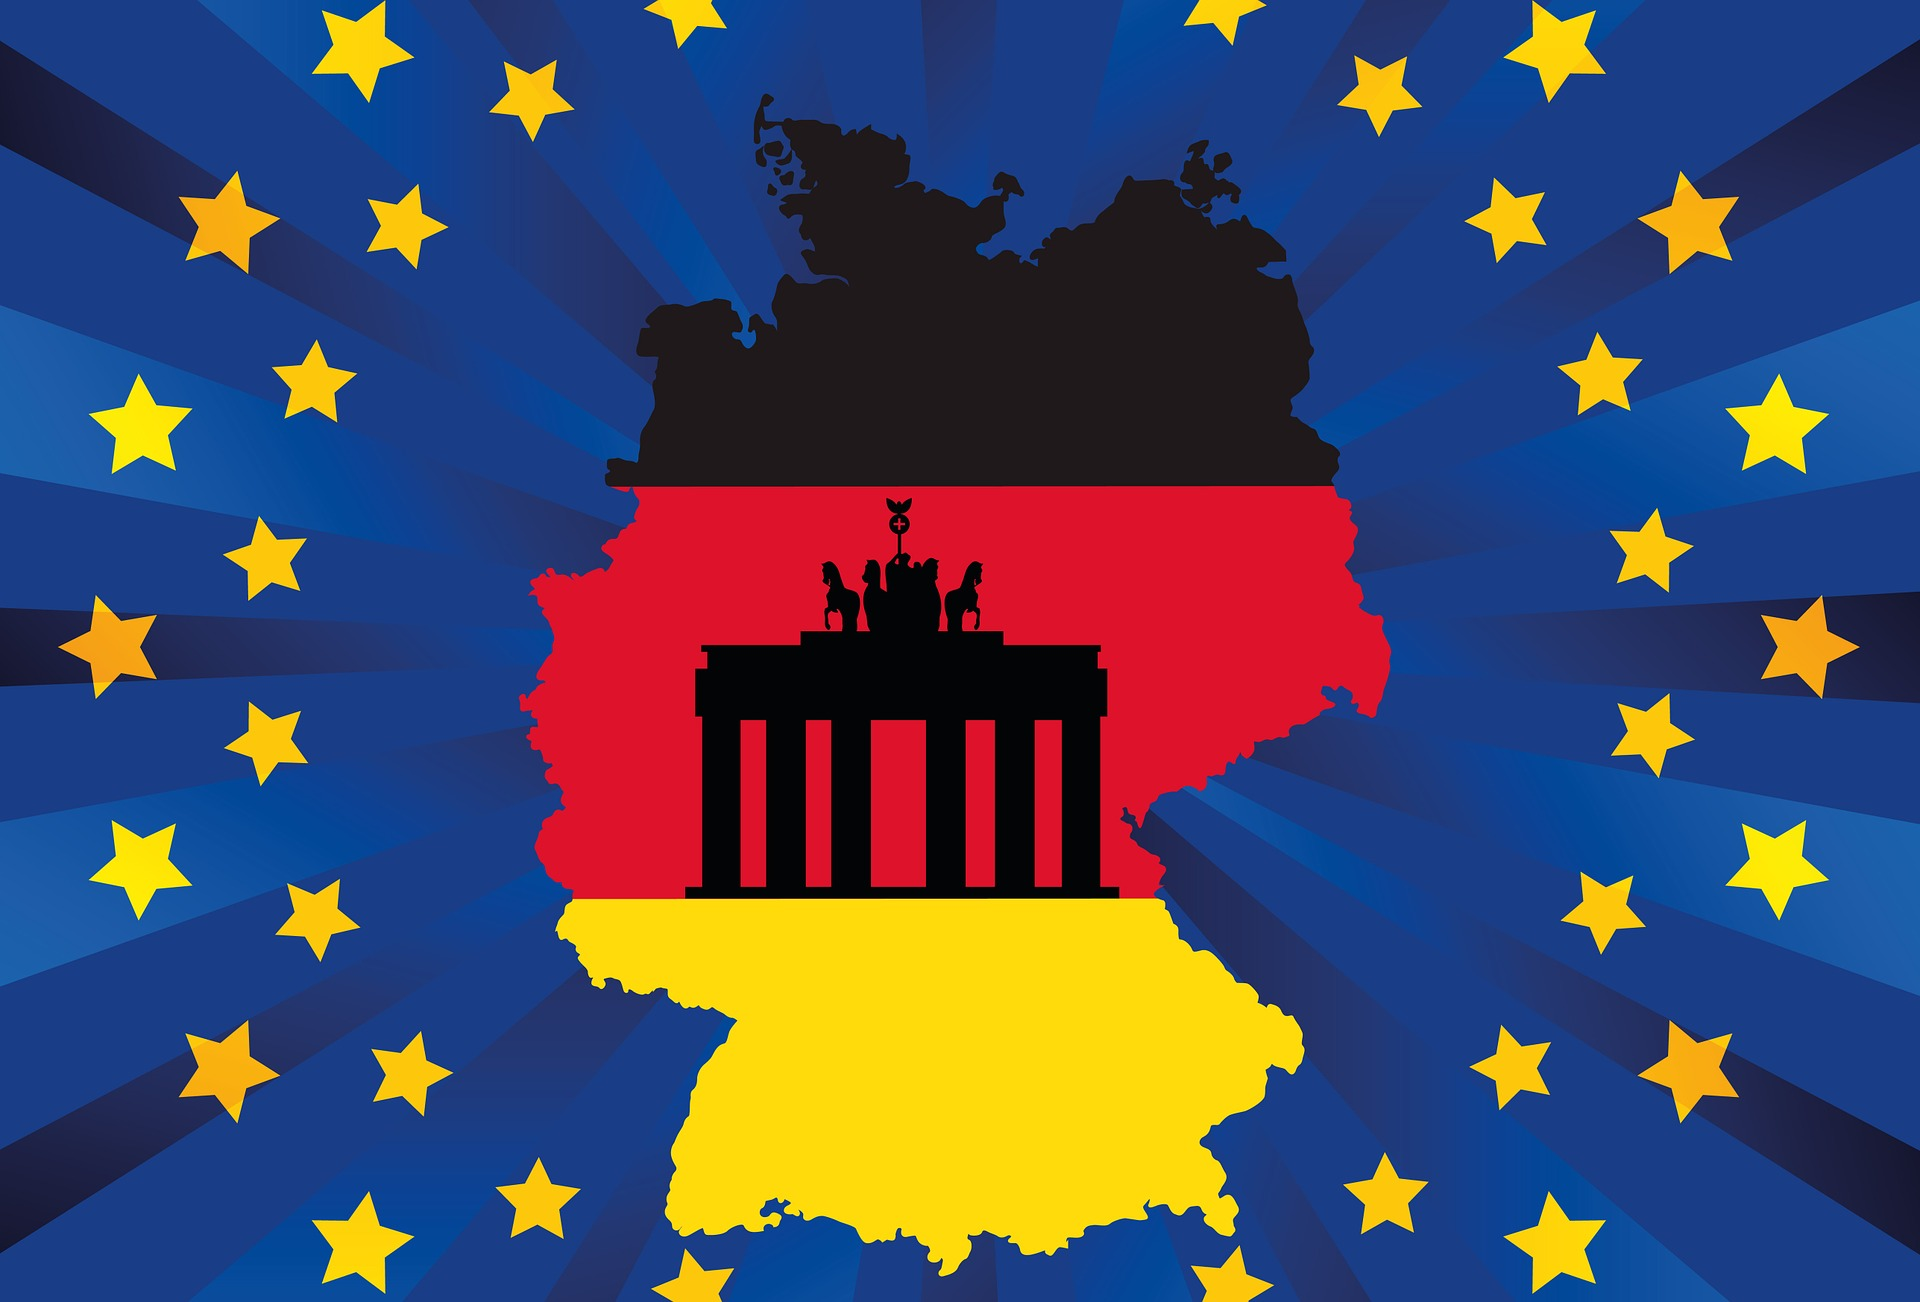 L'Allemagne, leader malgré elle de l'UE